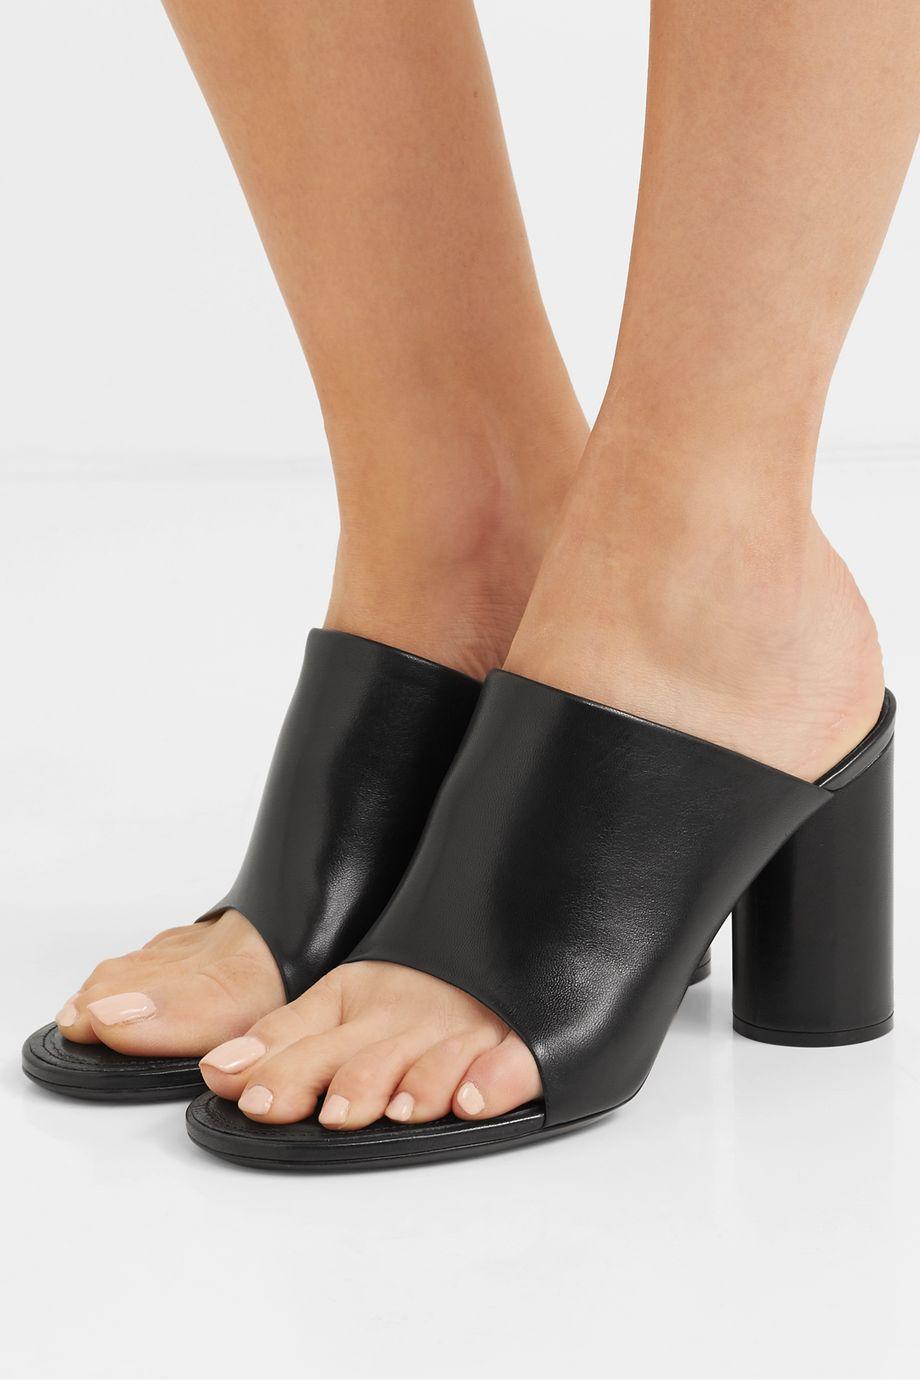 Balenciaga 皮革穆勒鞋